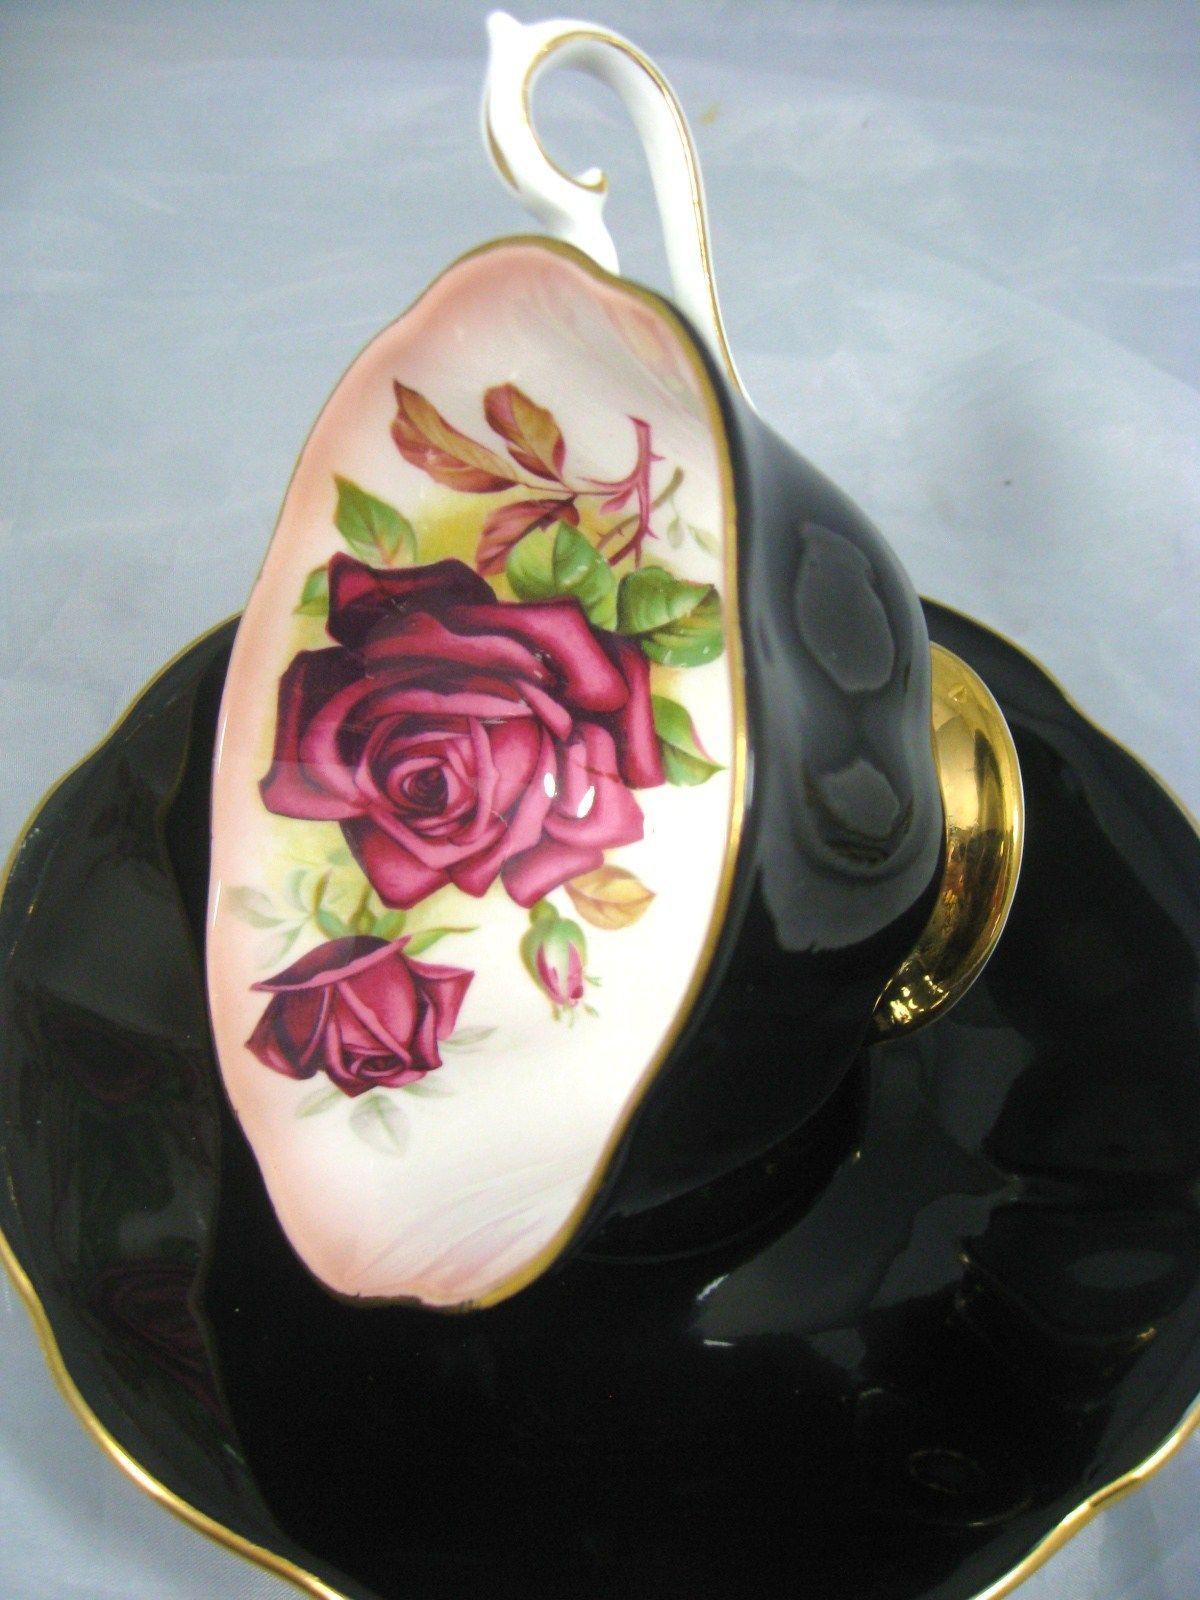 Royal albert bone china tea cup amp saucer winsome pattern ebay - Details About Royal Albert Milady Series Black Burgundy Rose Tea Cup And Saucer